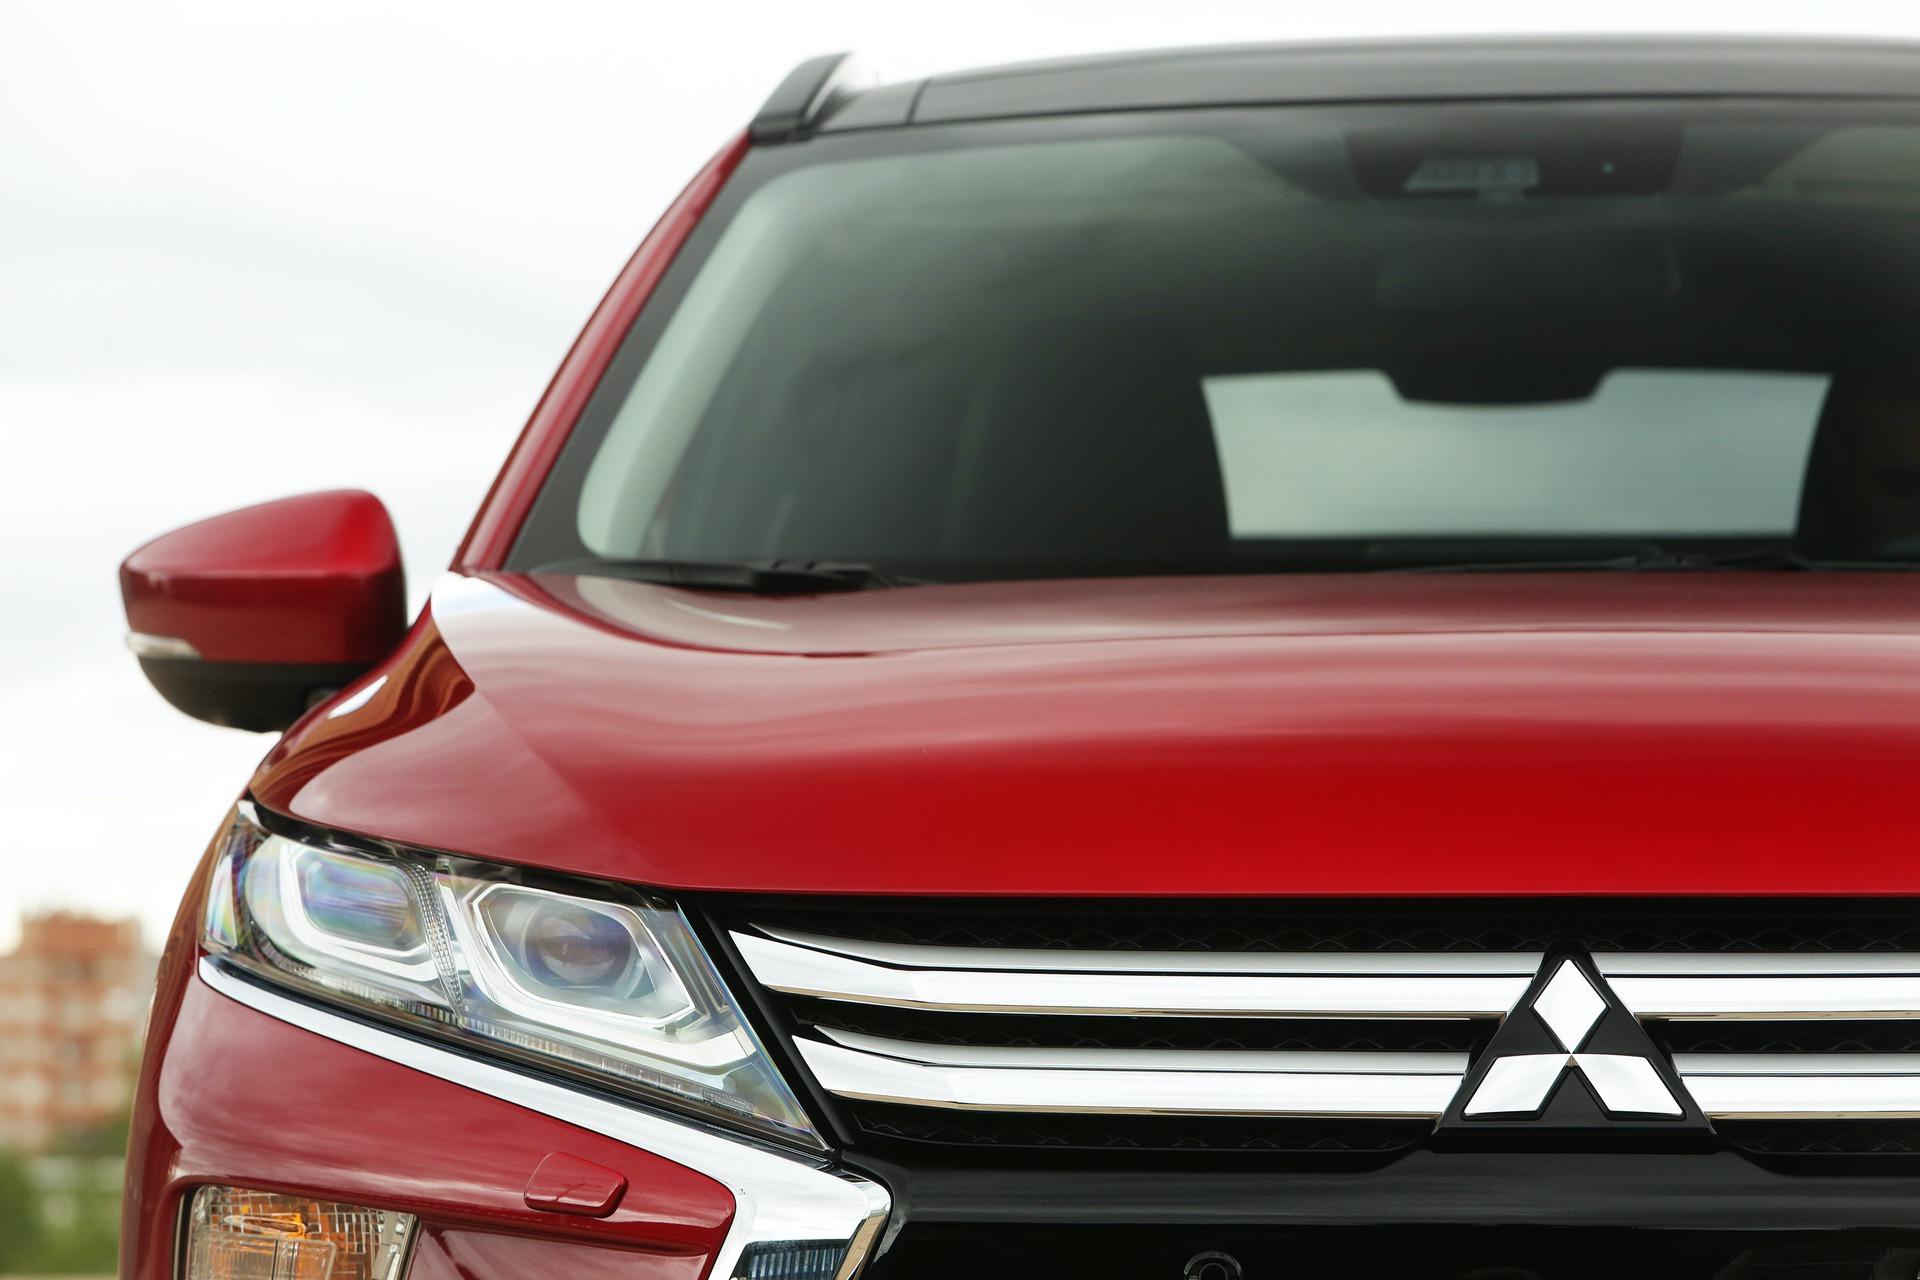 First_Drive_Mitsubishi_Eclipse_Cross_0070